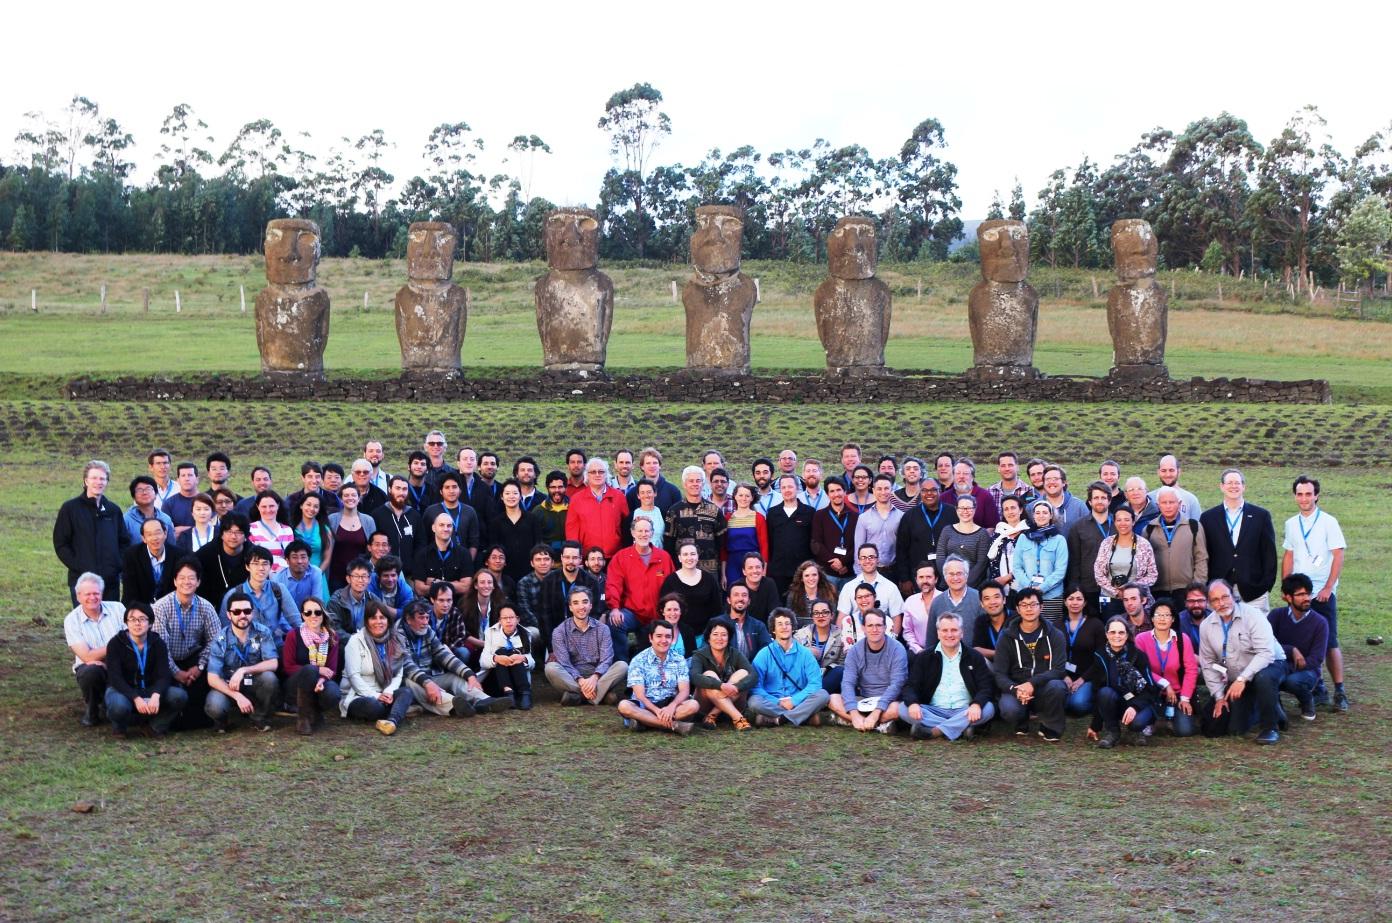 Núcleo de Astronomía participó en inédita conferencia internacional de astronomía en Isla de Pascua